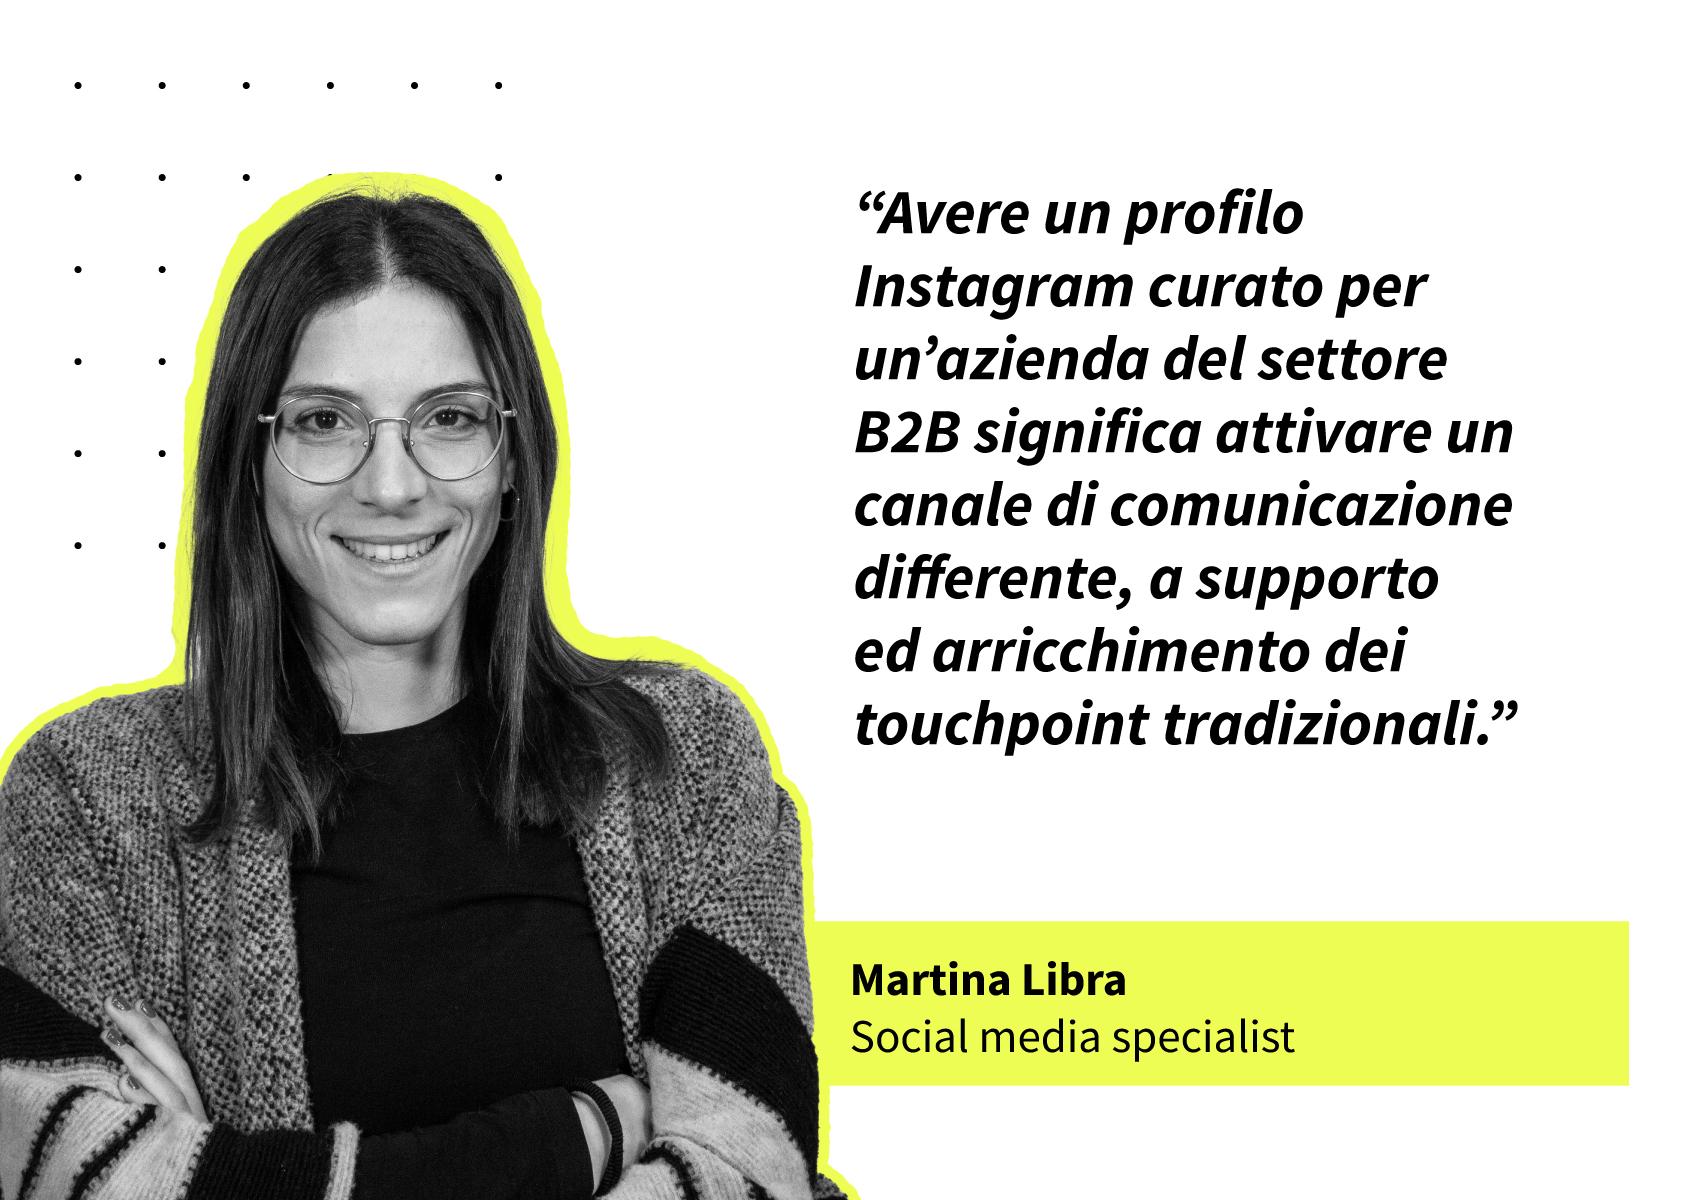 Blog-post-ig-b2b-2021-quote-martina